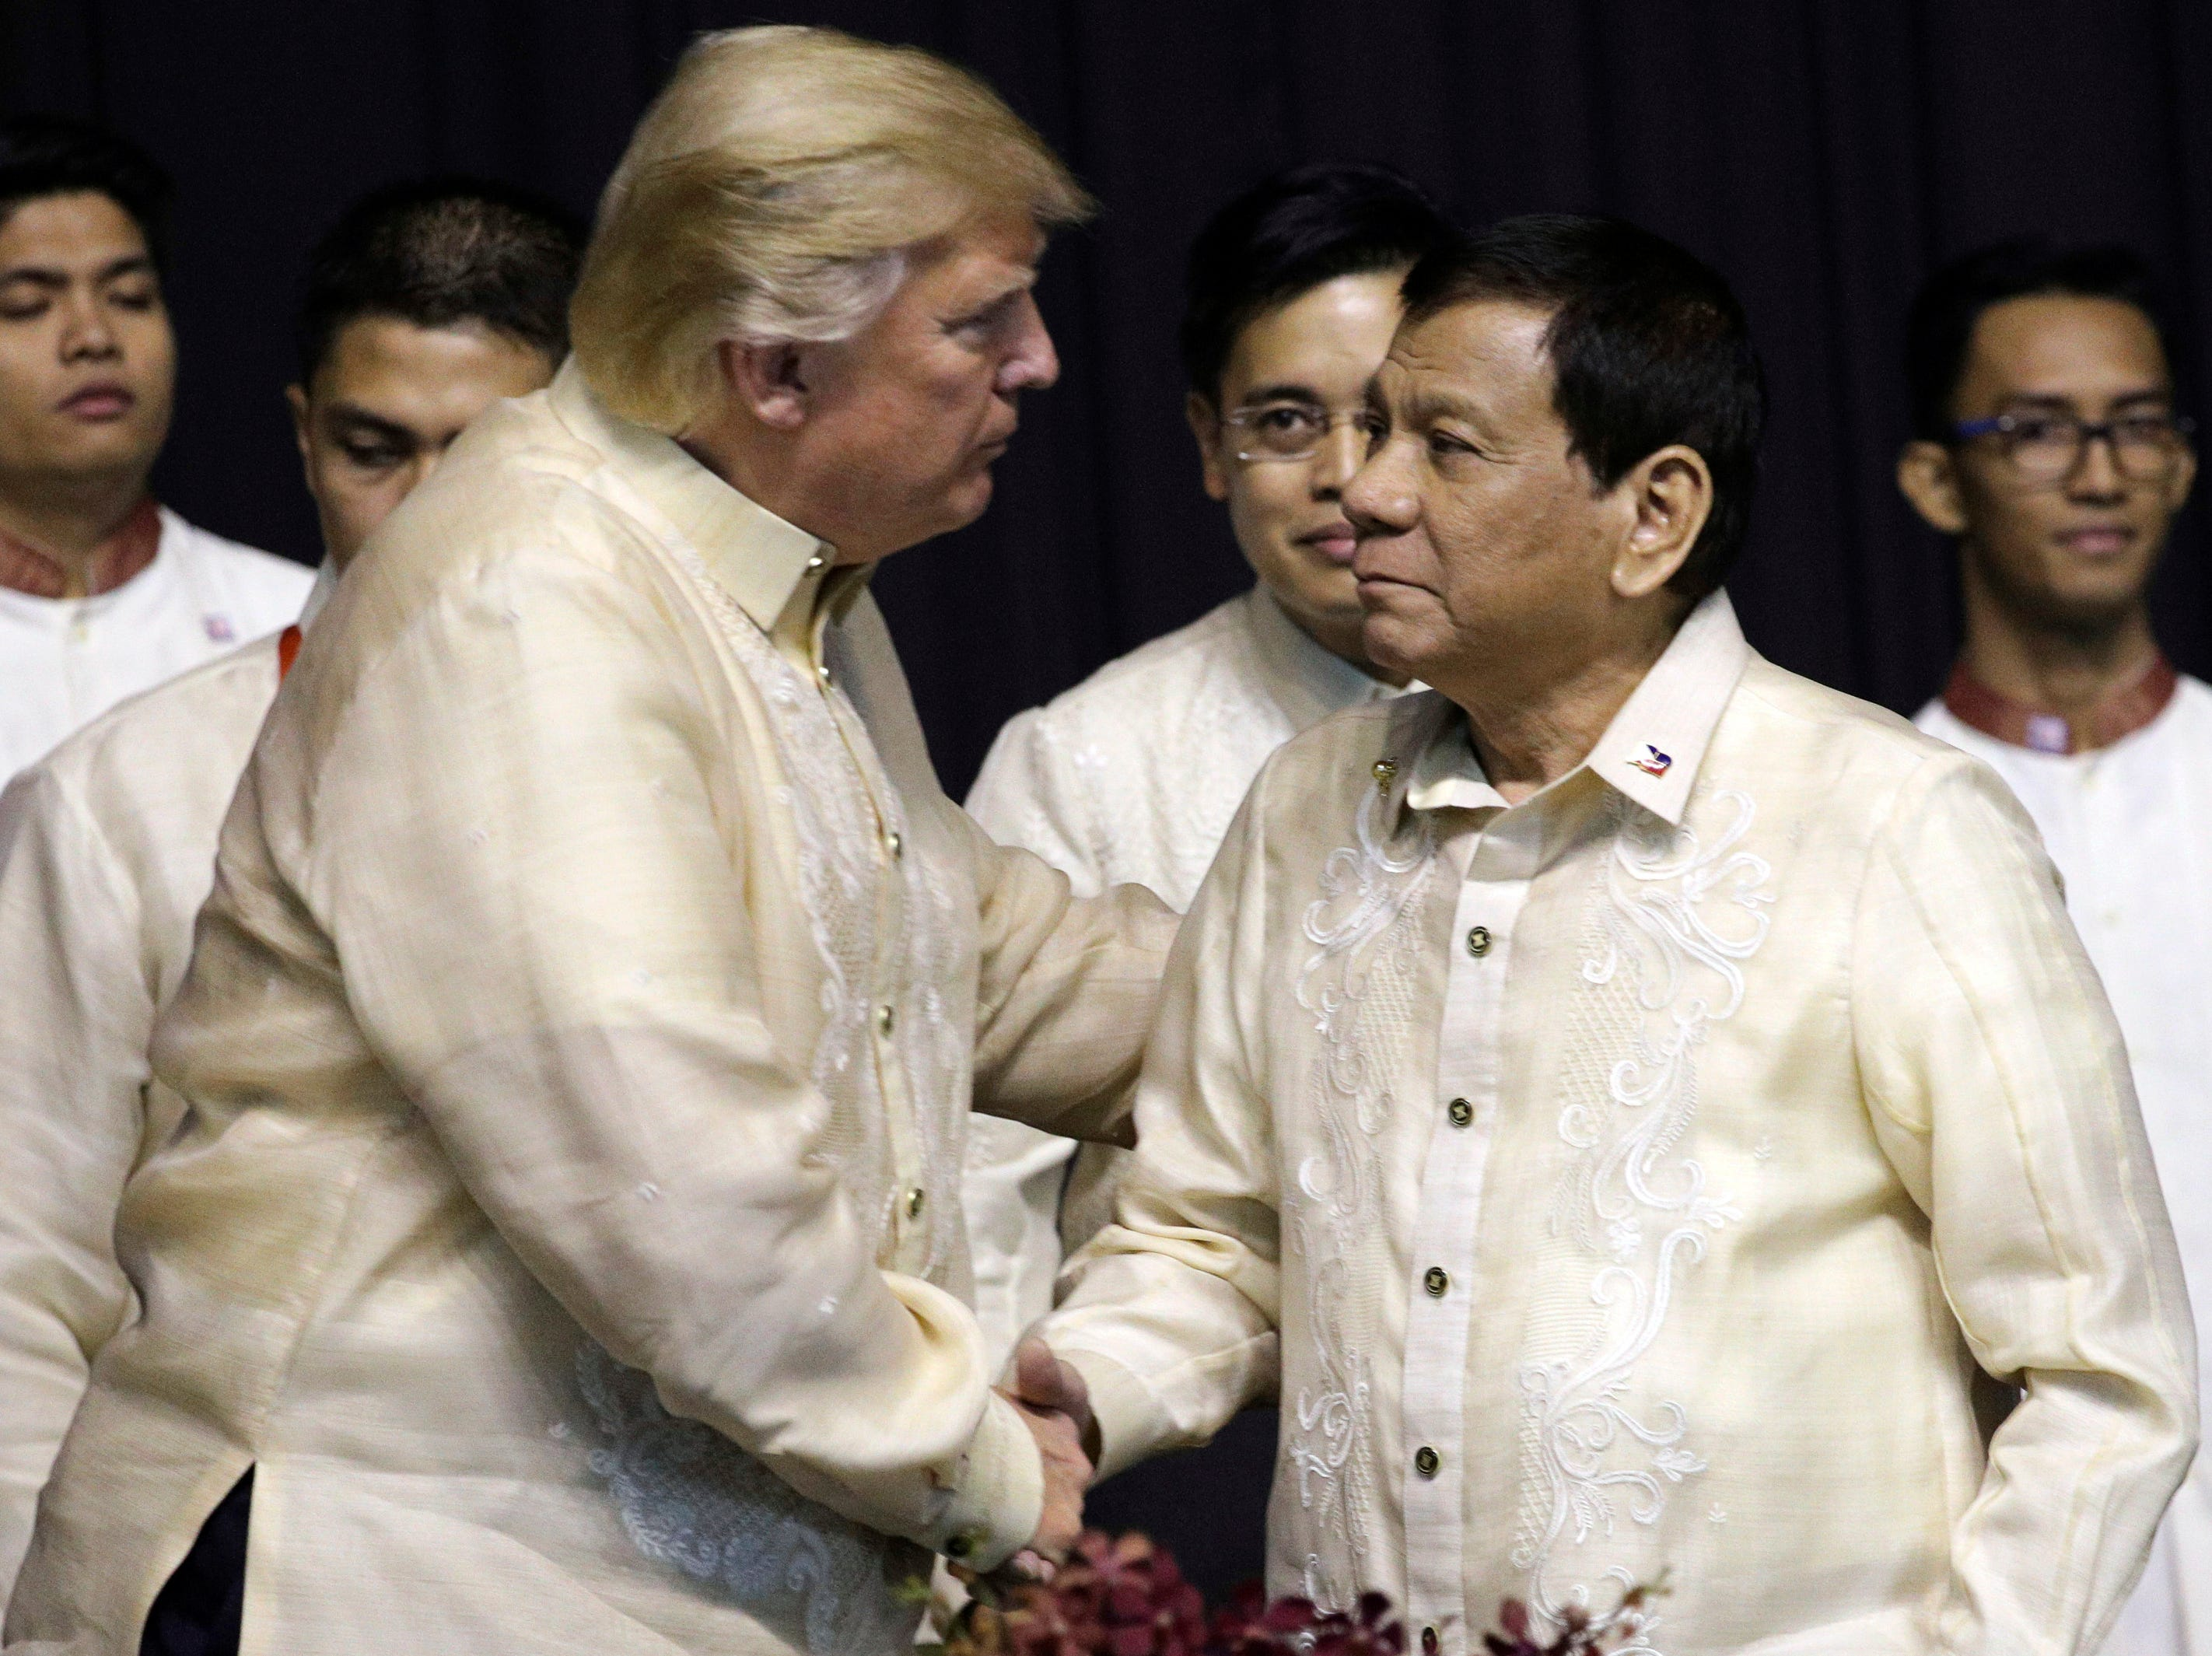 President Trump shakes hands with Philippines President Rodrigo Duterte  during the gala dinner marking ASEAN's 50th anniversary in Manila, Philippines, on Nov. 12, 2017.